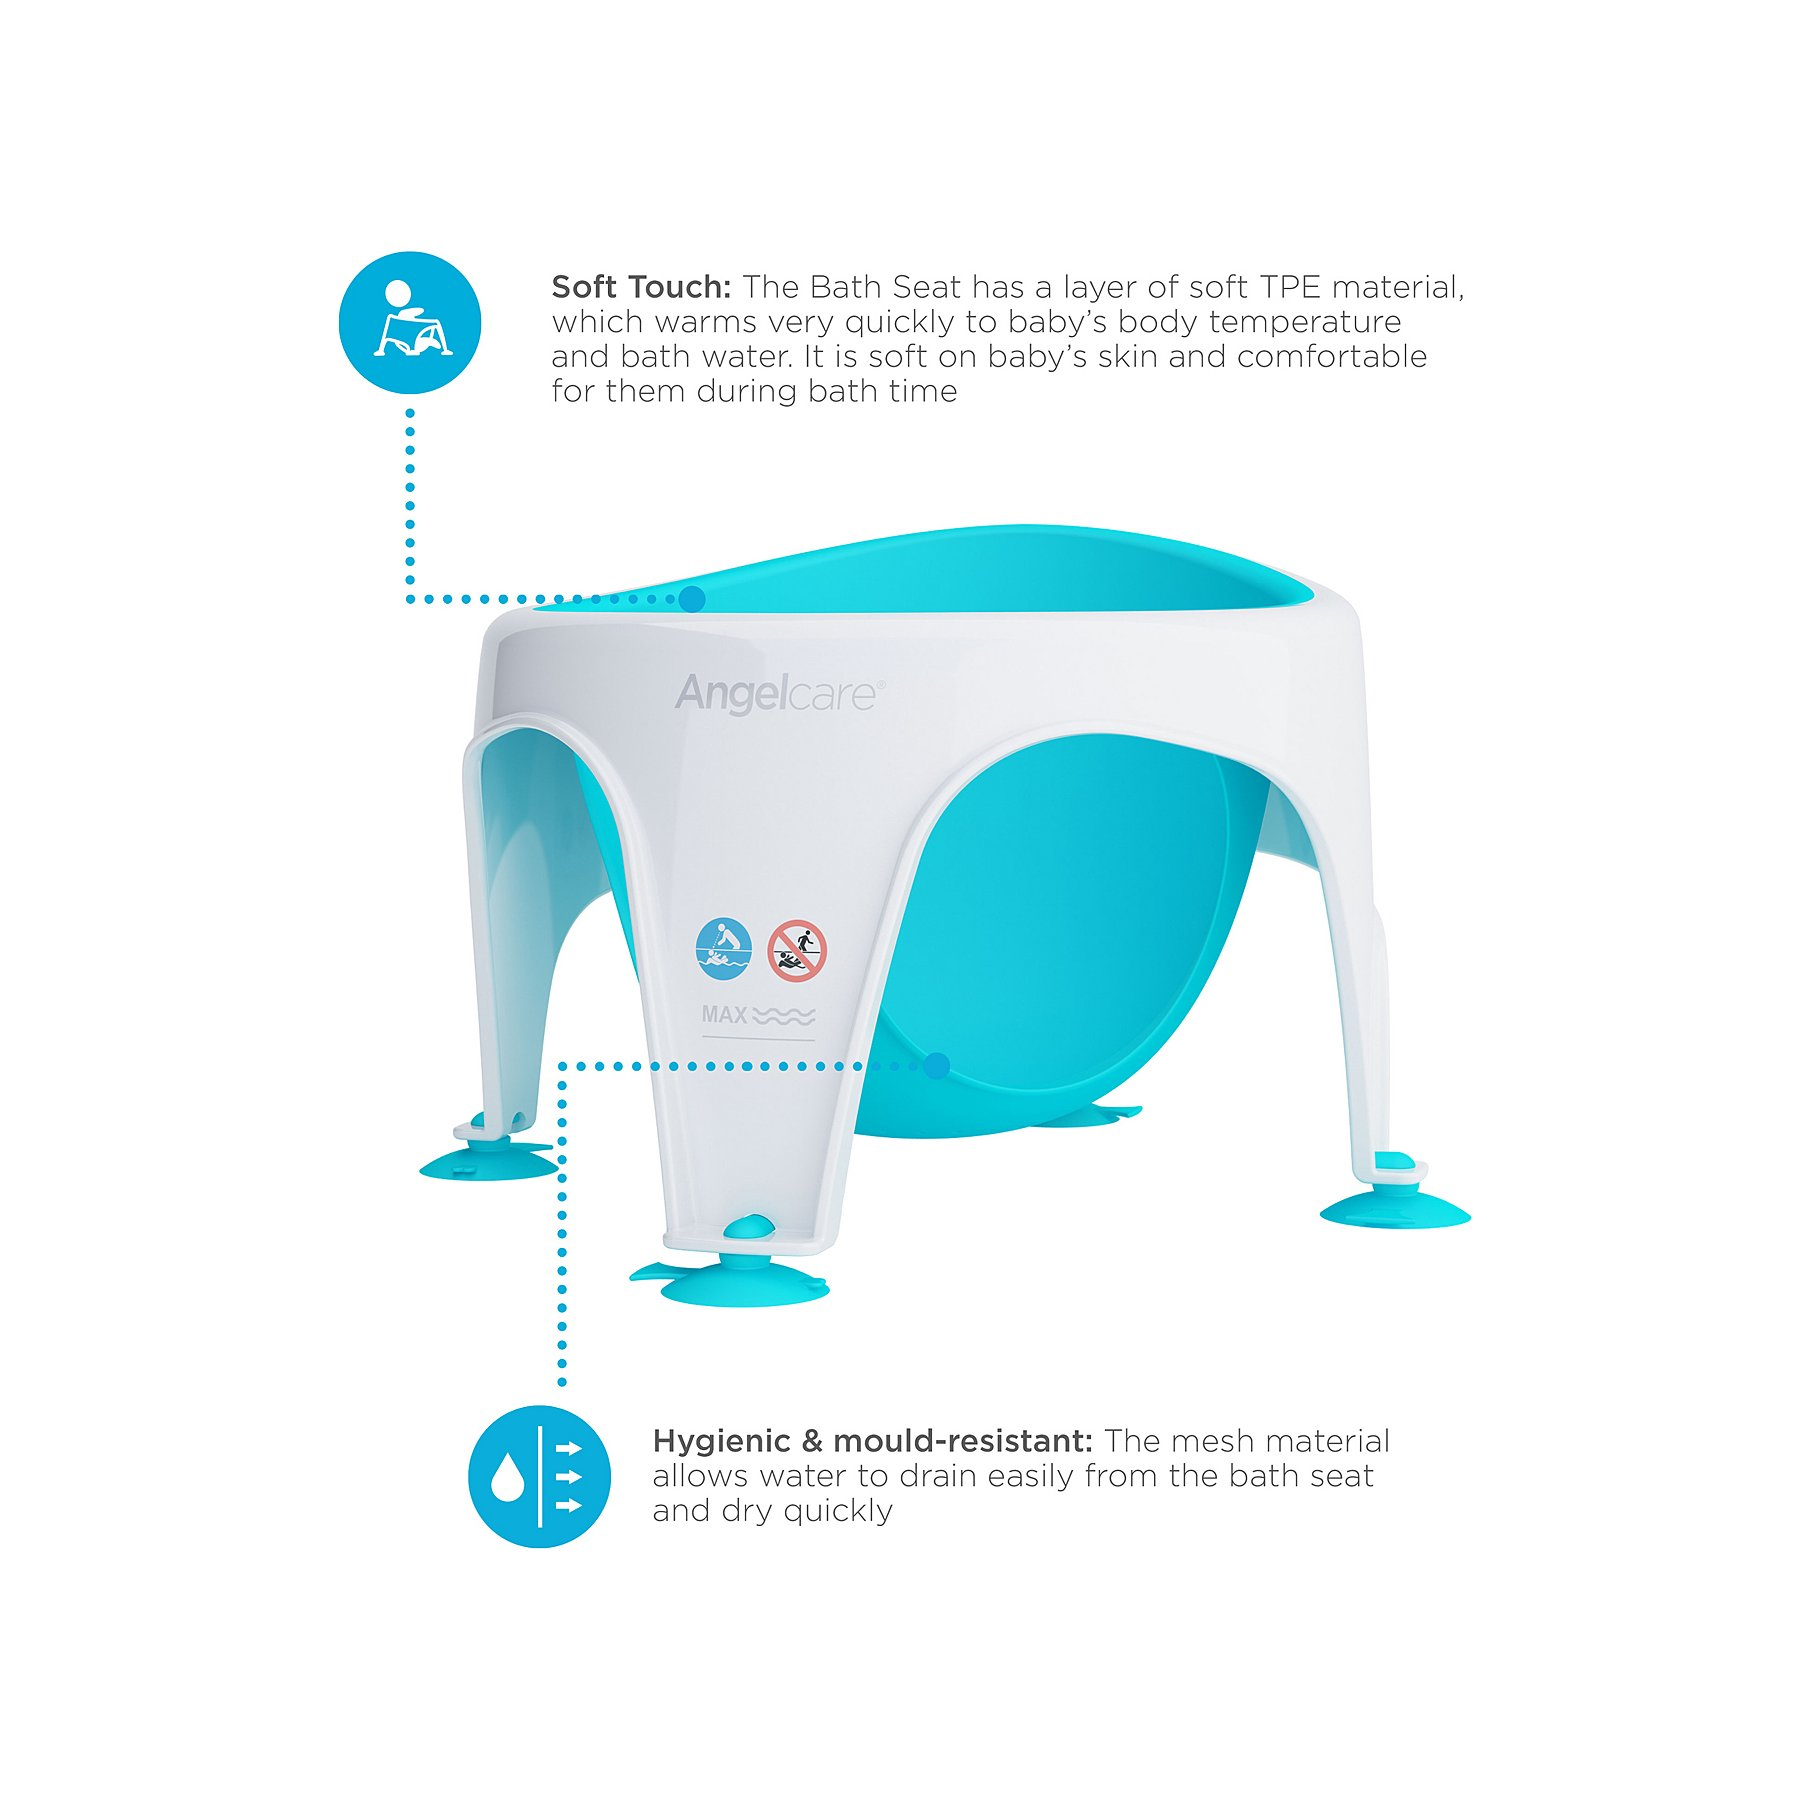 c22220627 Angelcare Soft Touch Bath Seat - Aqua